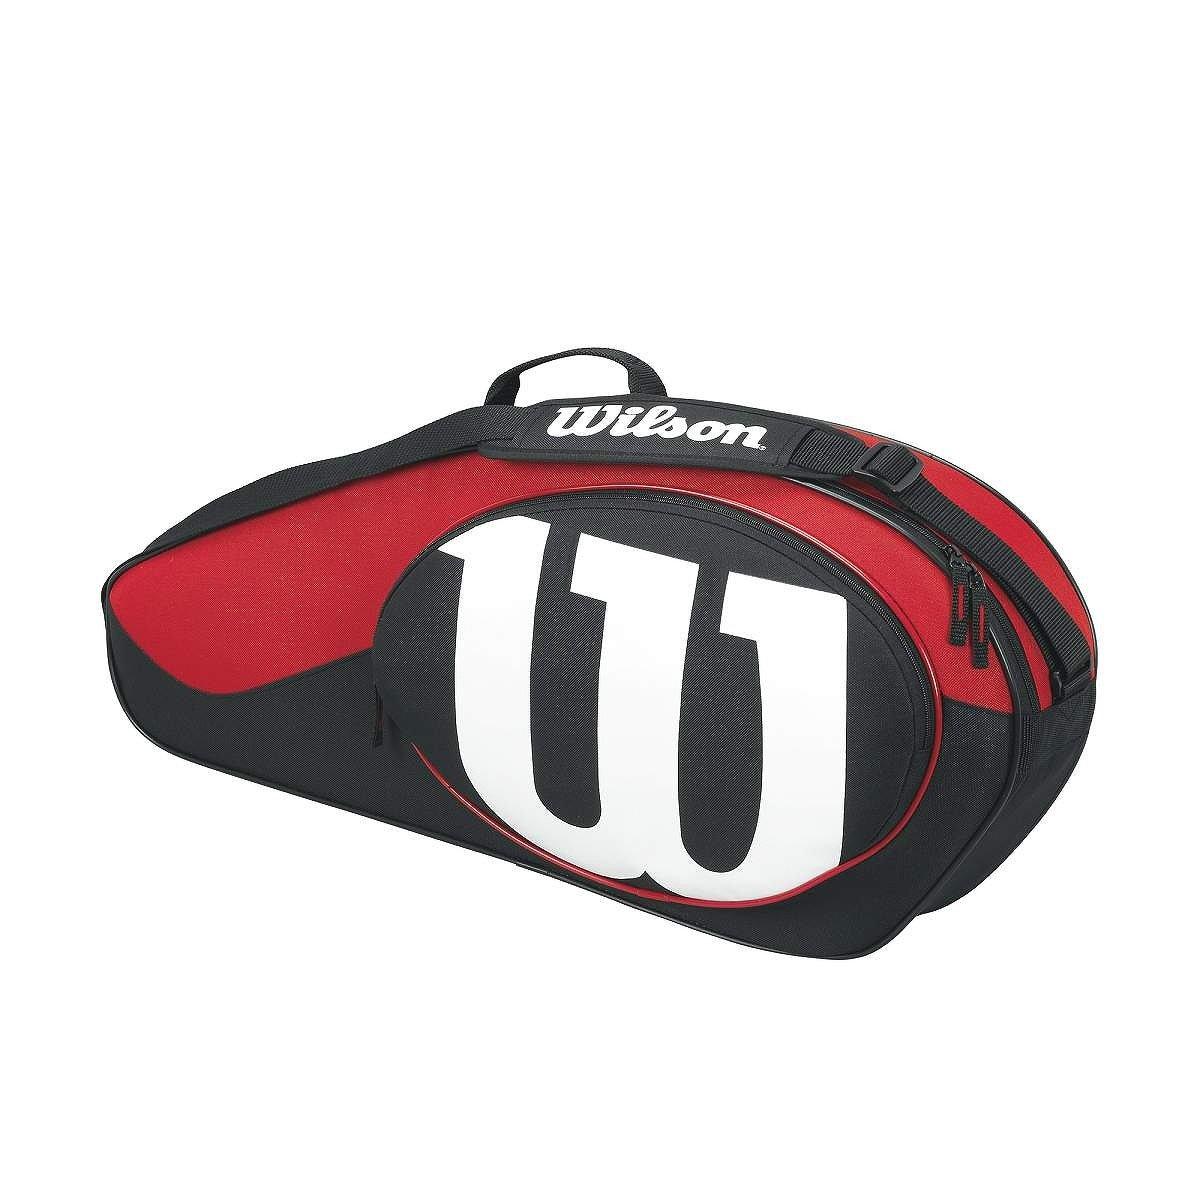 Wilson Match II Racquet Bag, Black/Red, holds 3 Racquets